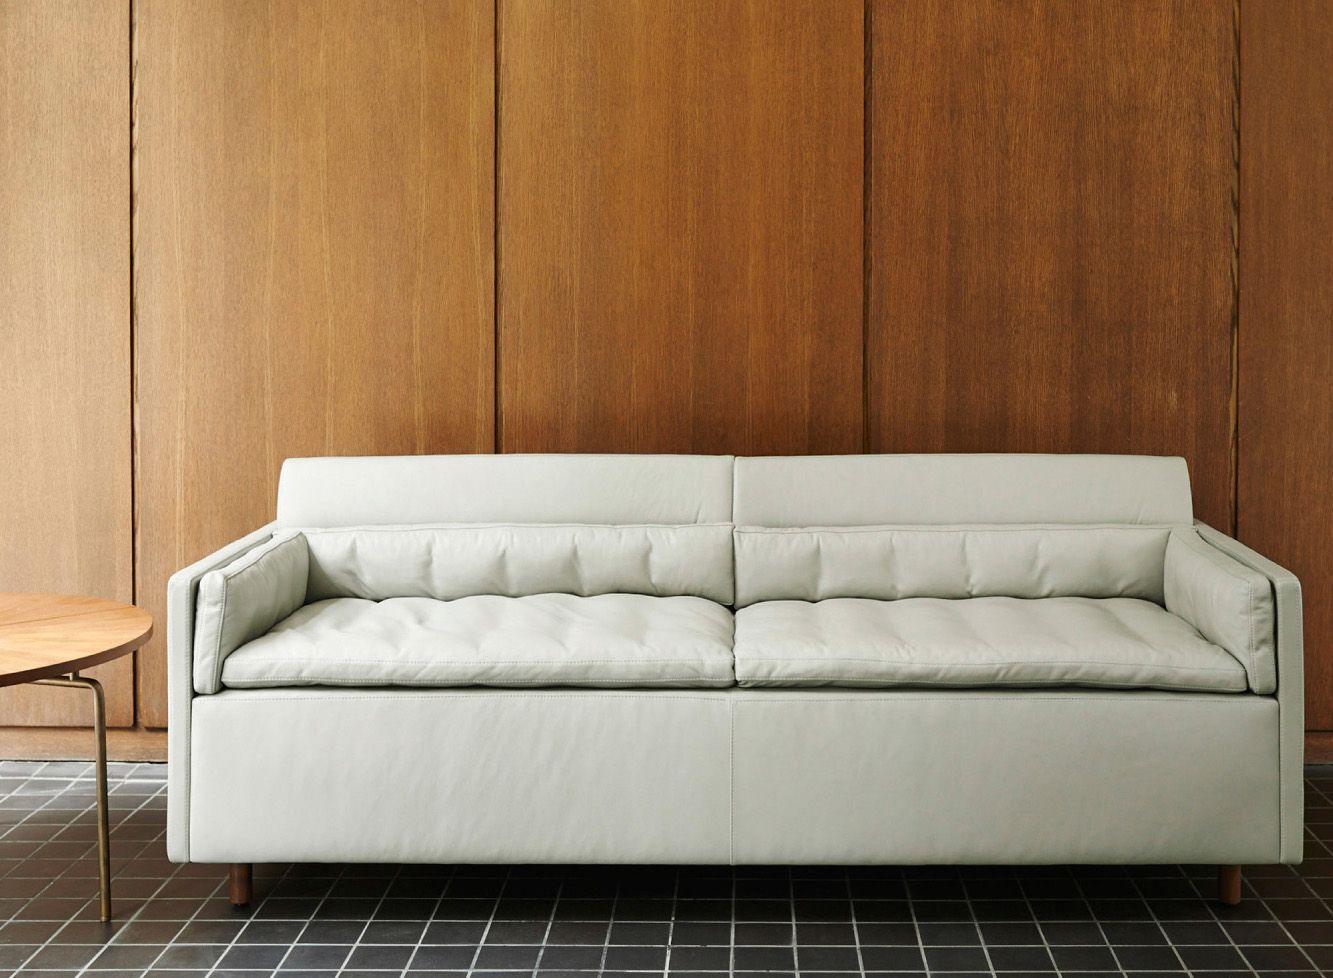 Salon Sofa in grey leather